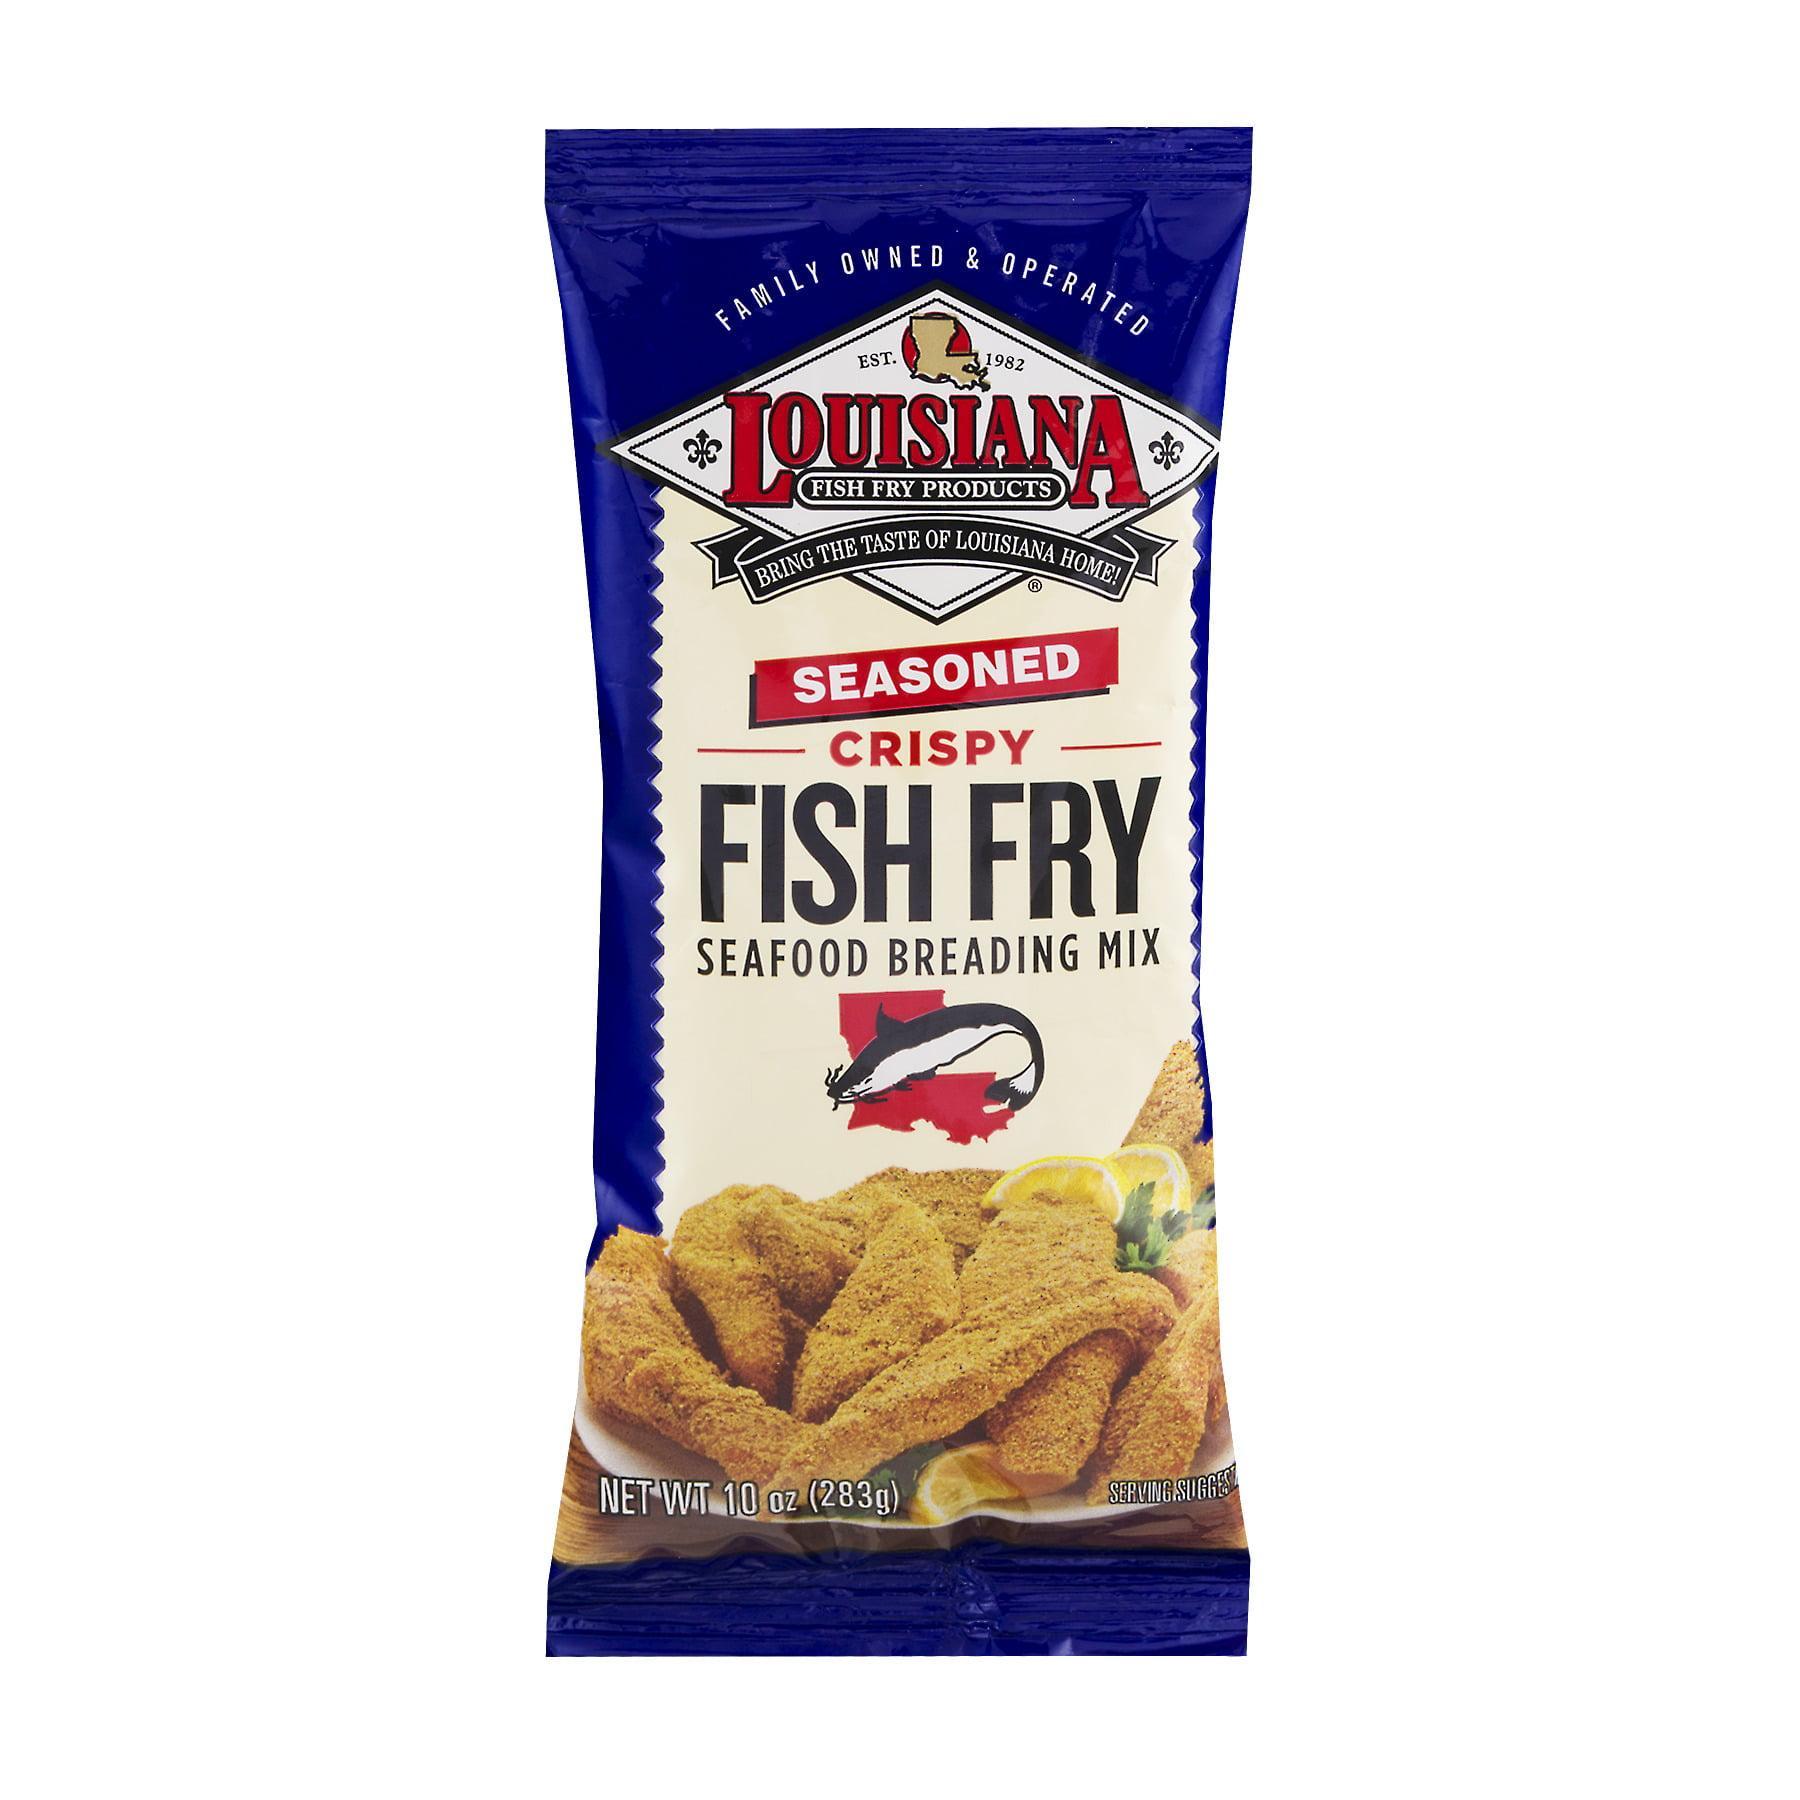 (5 Pack) Louisiana Fish Fry Products: Seasoned Fish Fry, 10 oz